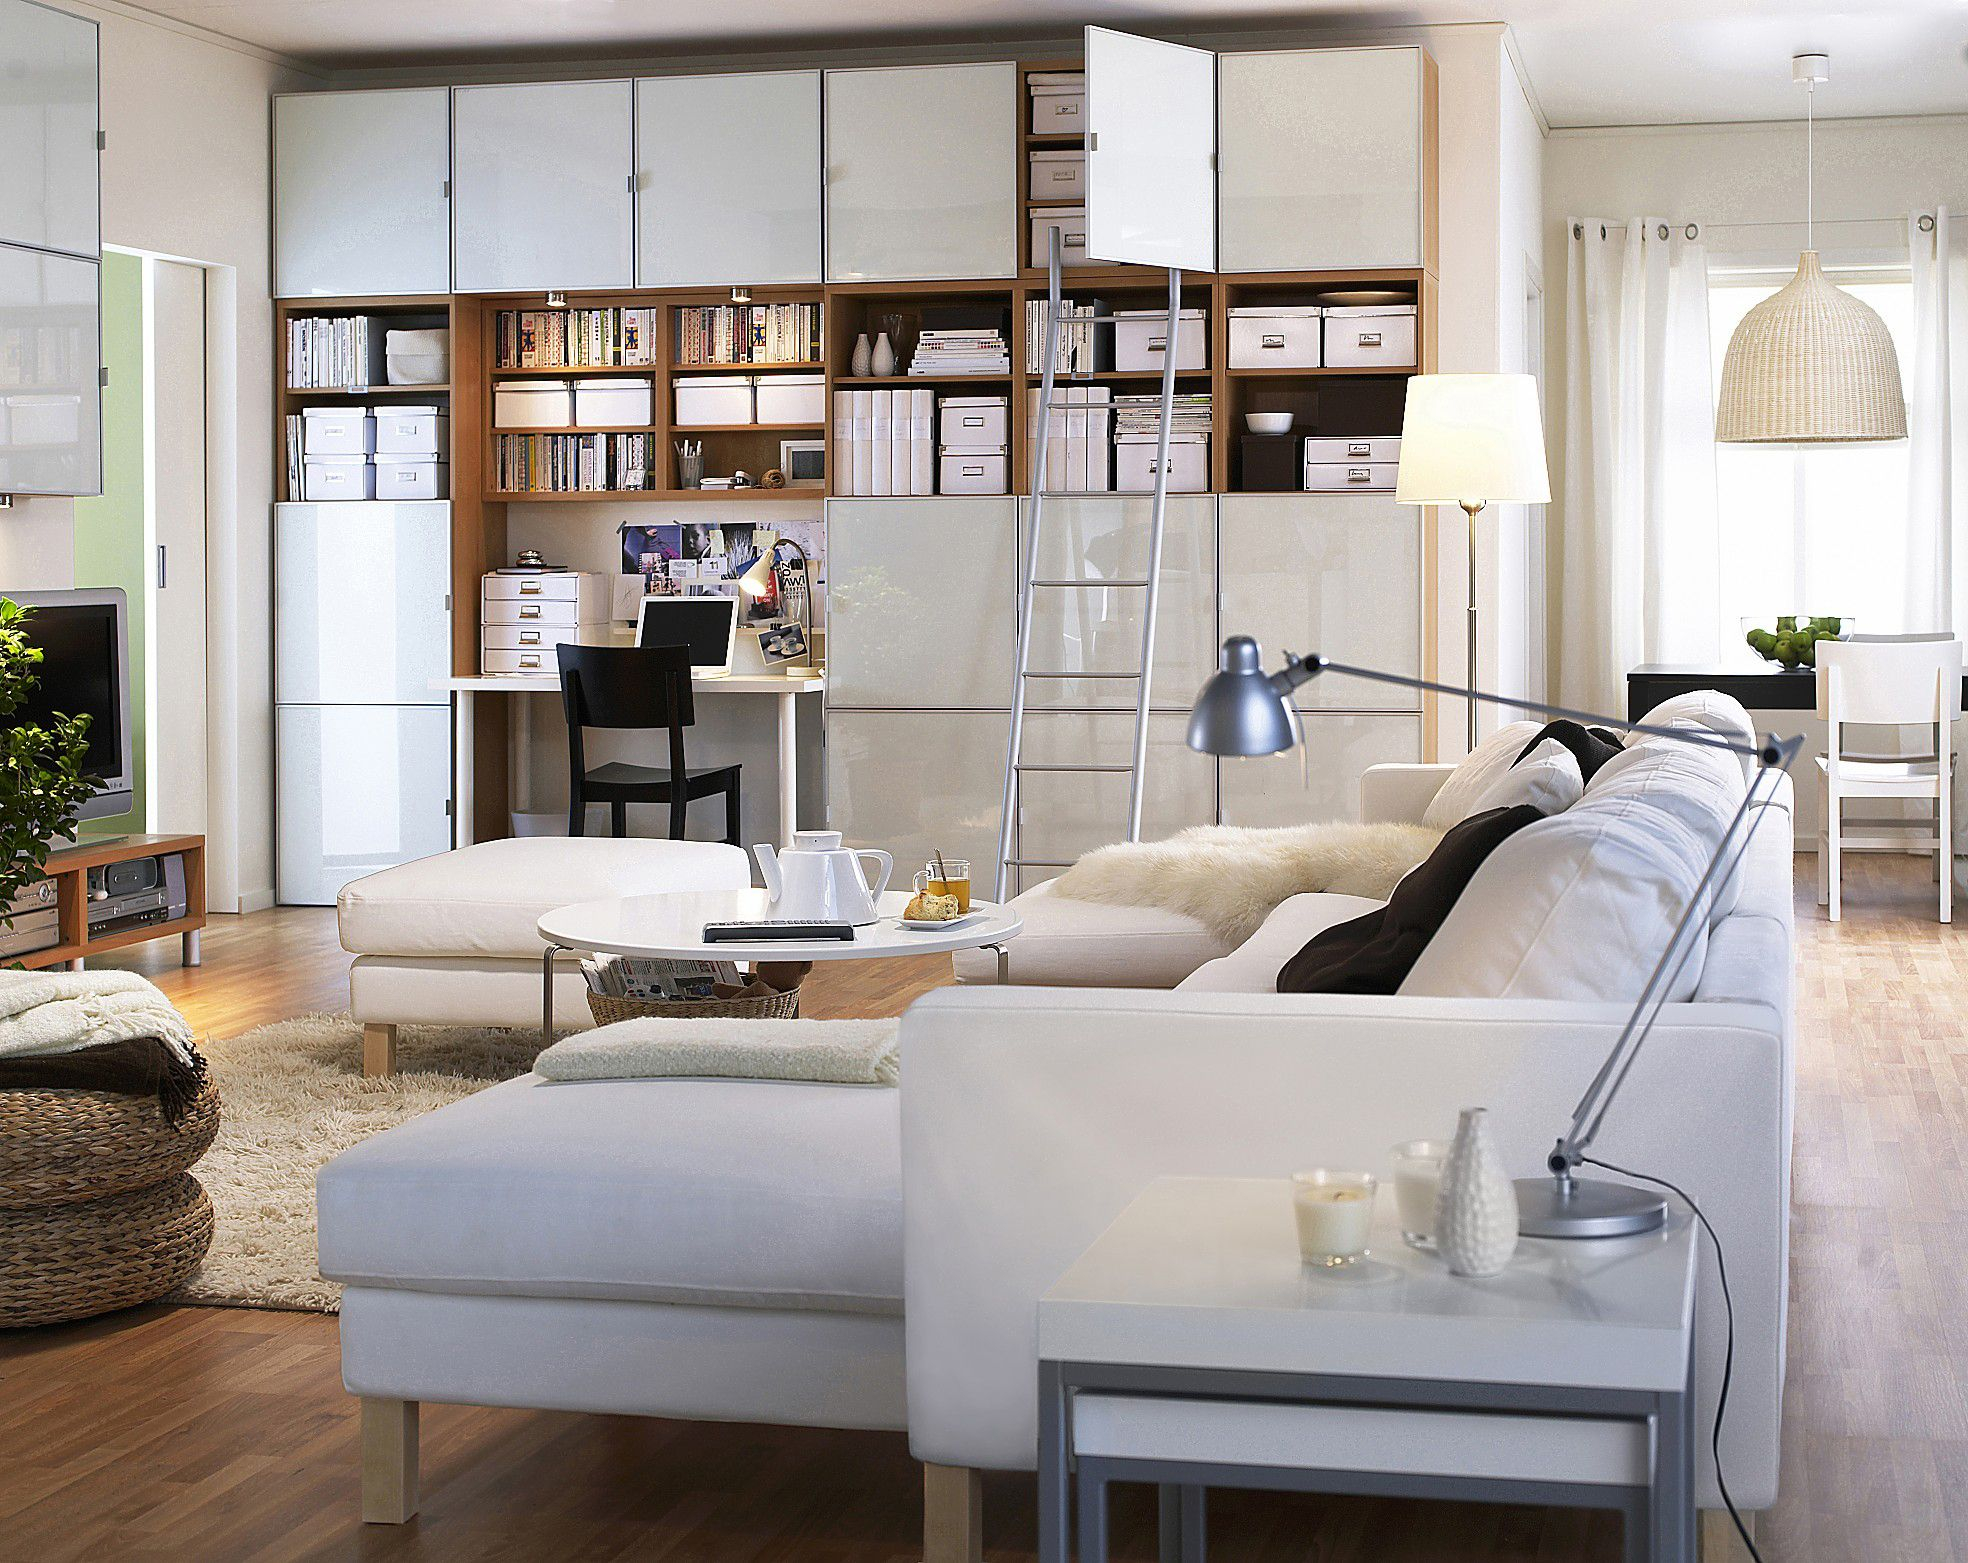 ambitious and bative IKEA EINRICHTUNGSIDEEN WOHNZIMMER